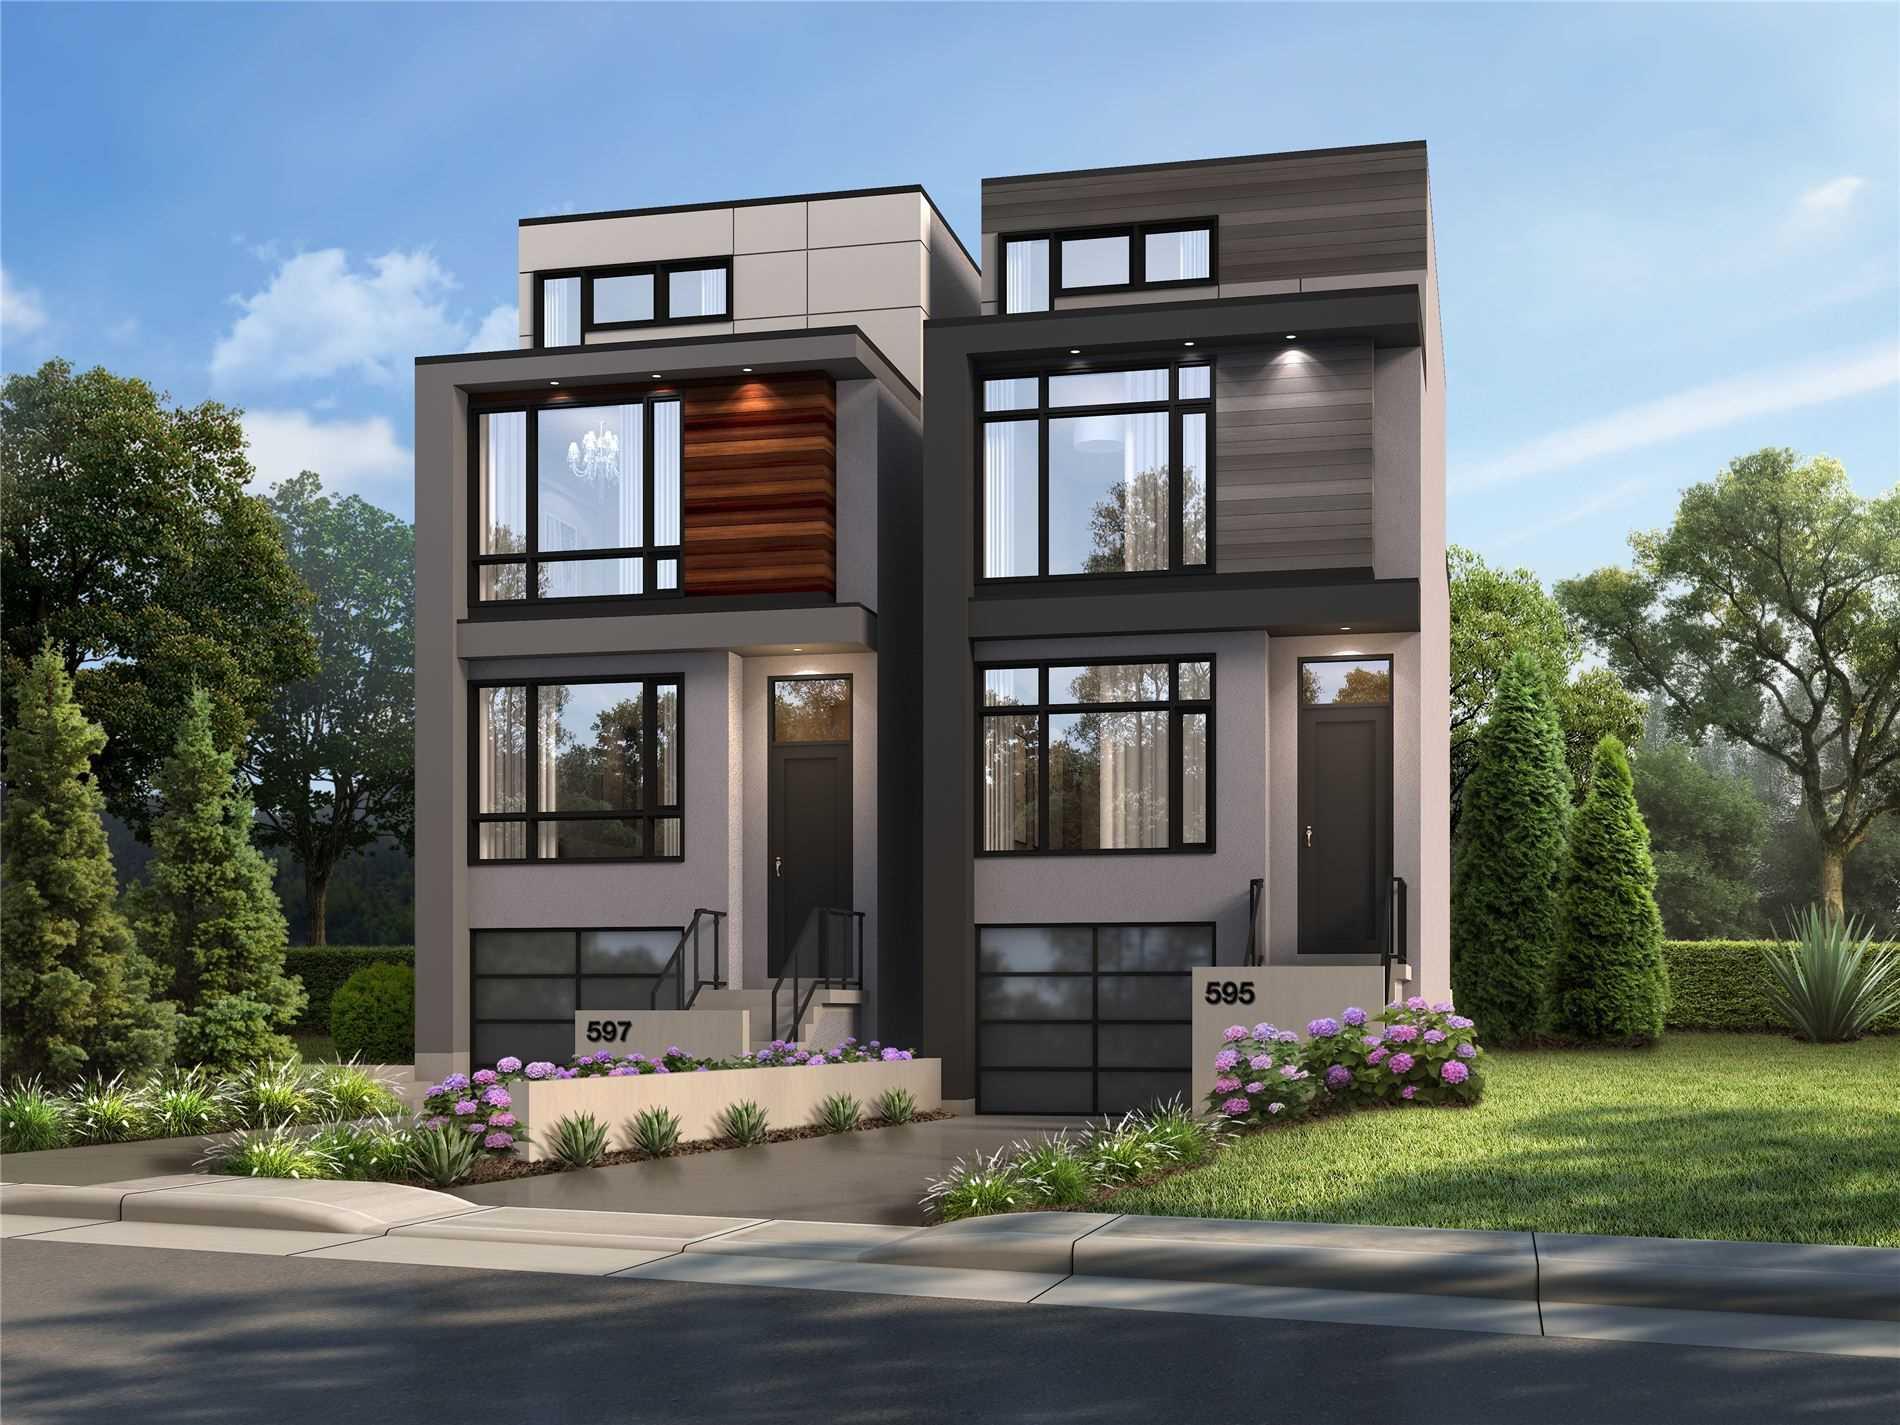 597 Mcroberts Ave, Toronto, Ontario M6E4R5, 4 Bedrooms Bedrooms, 7 Rooms Rooms,8 BathroomsBathrooms,Detached,For Sale,Mcroberts,W5362347